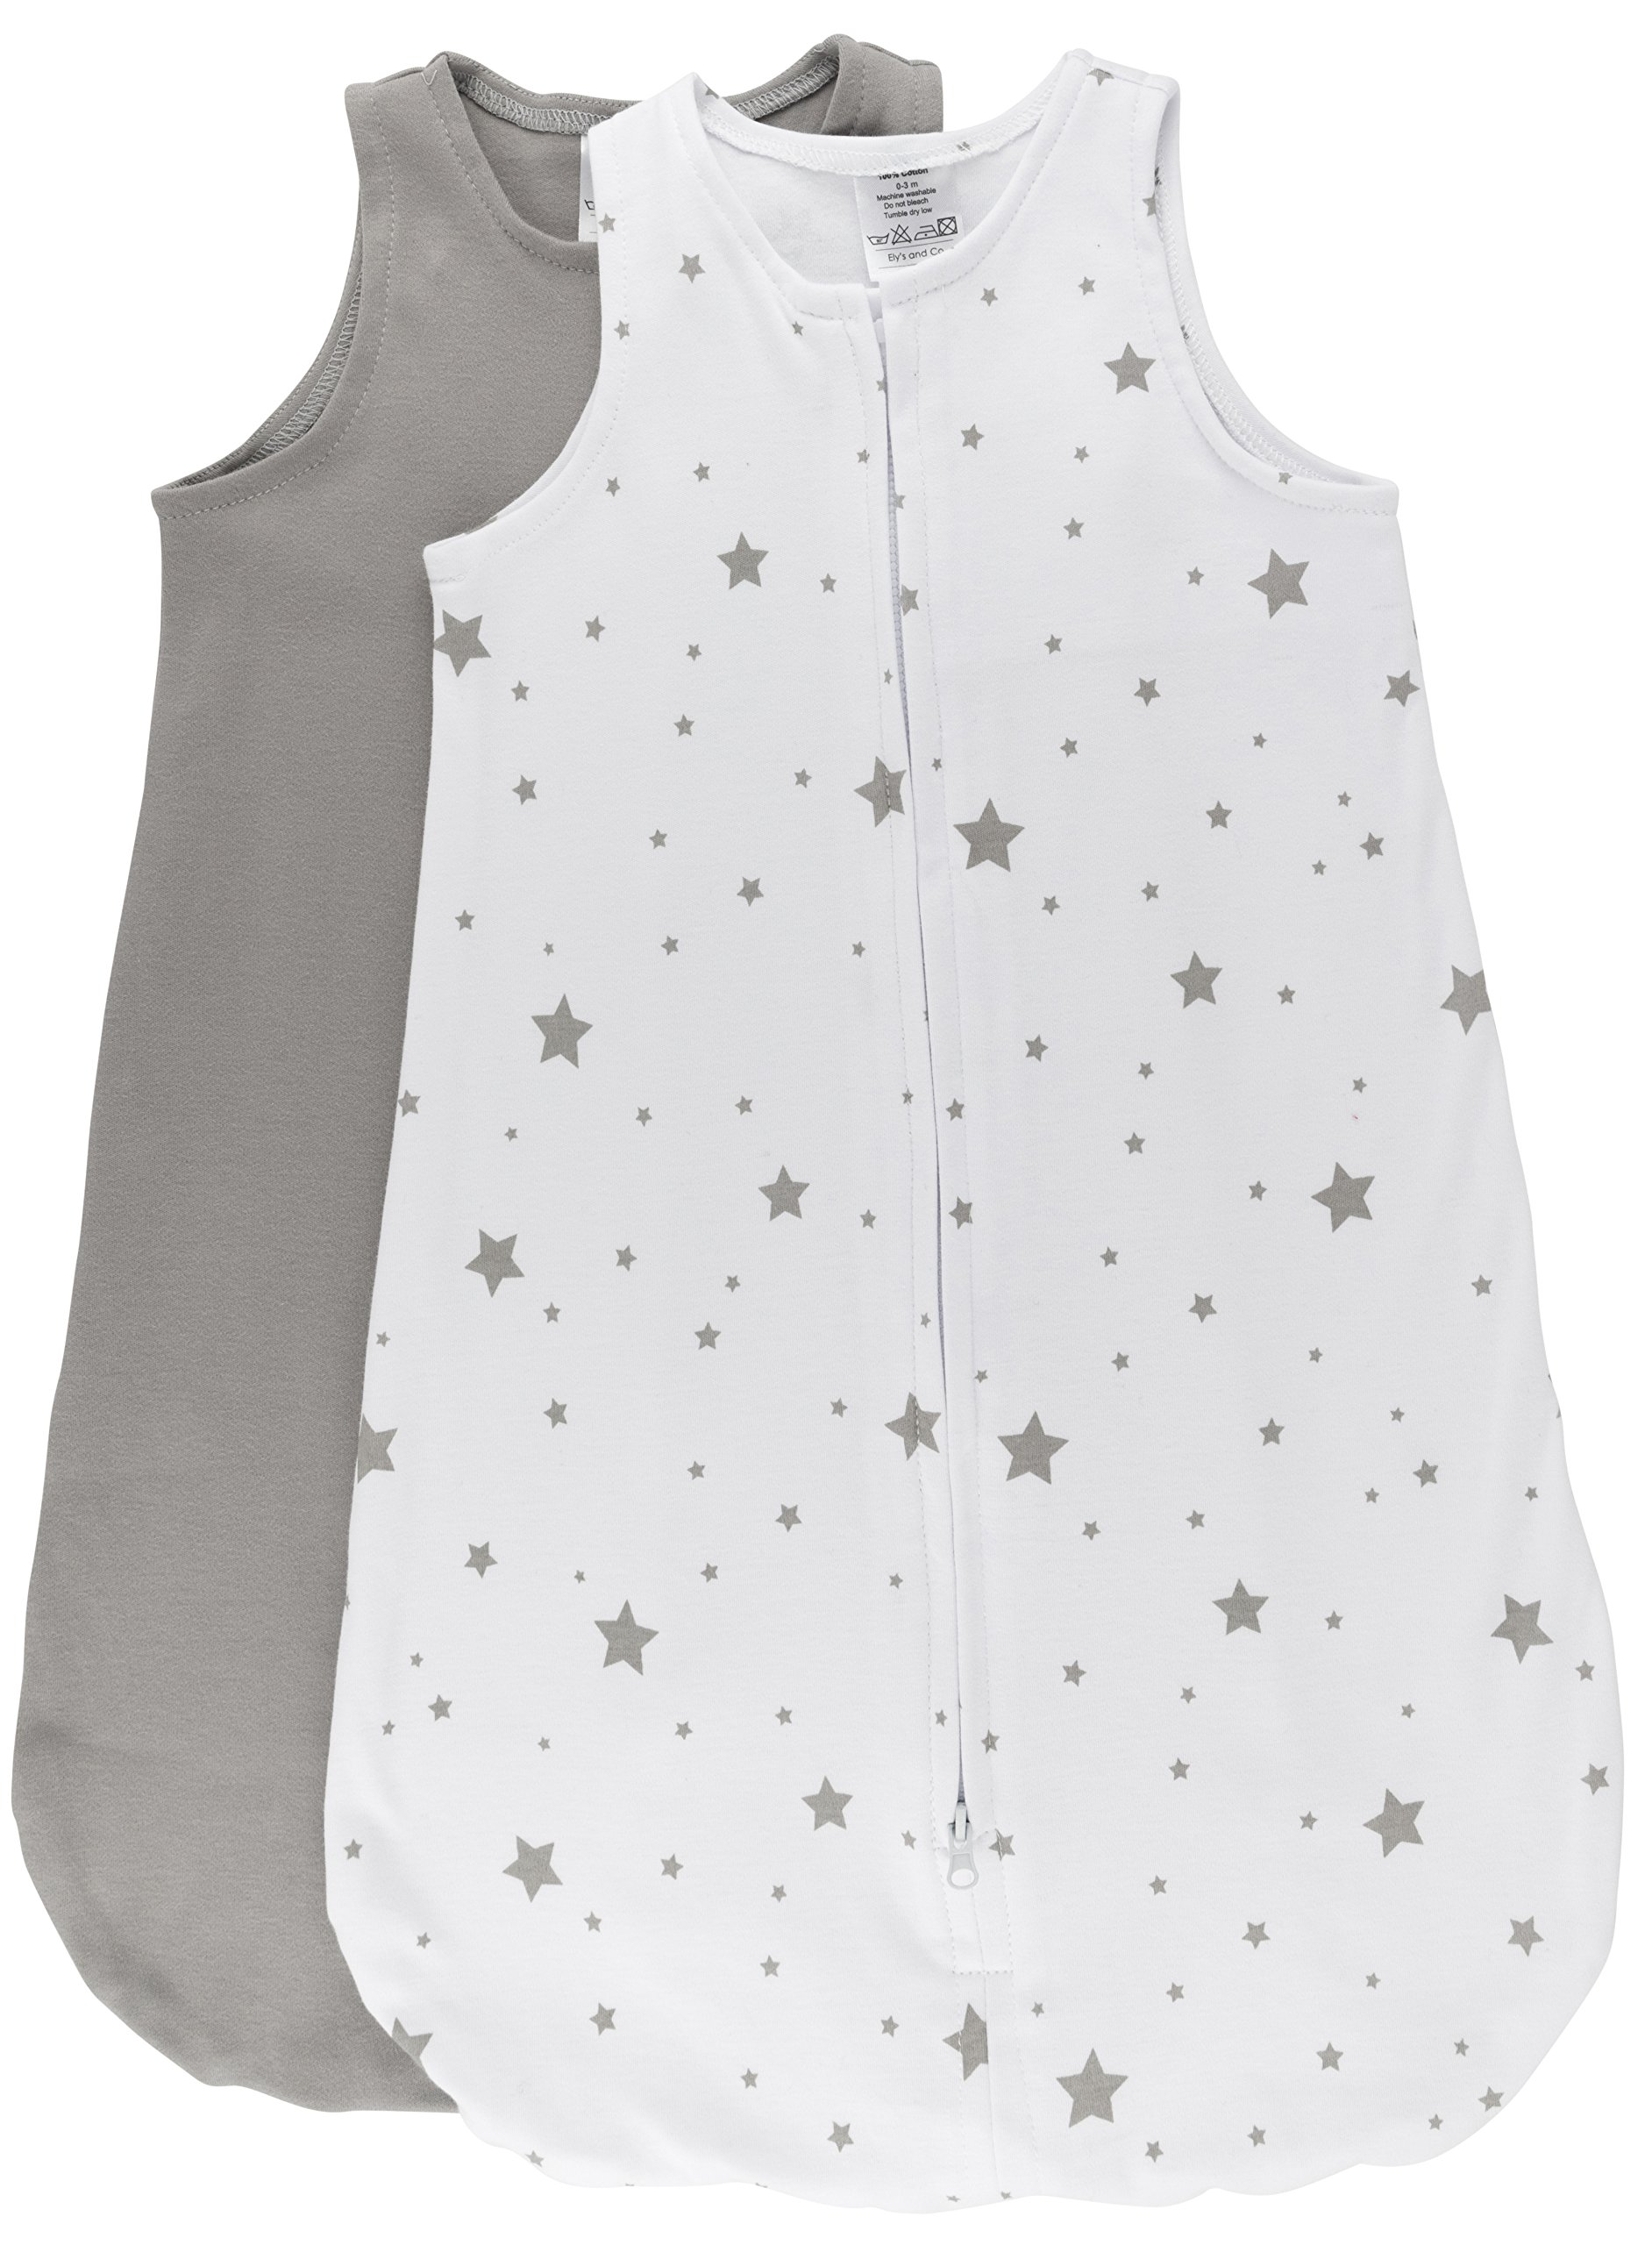 100% Cotton Wearable Blanket Baby Sleep Bag 2 Pack Grey Stars 3-6 Months